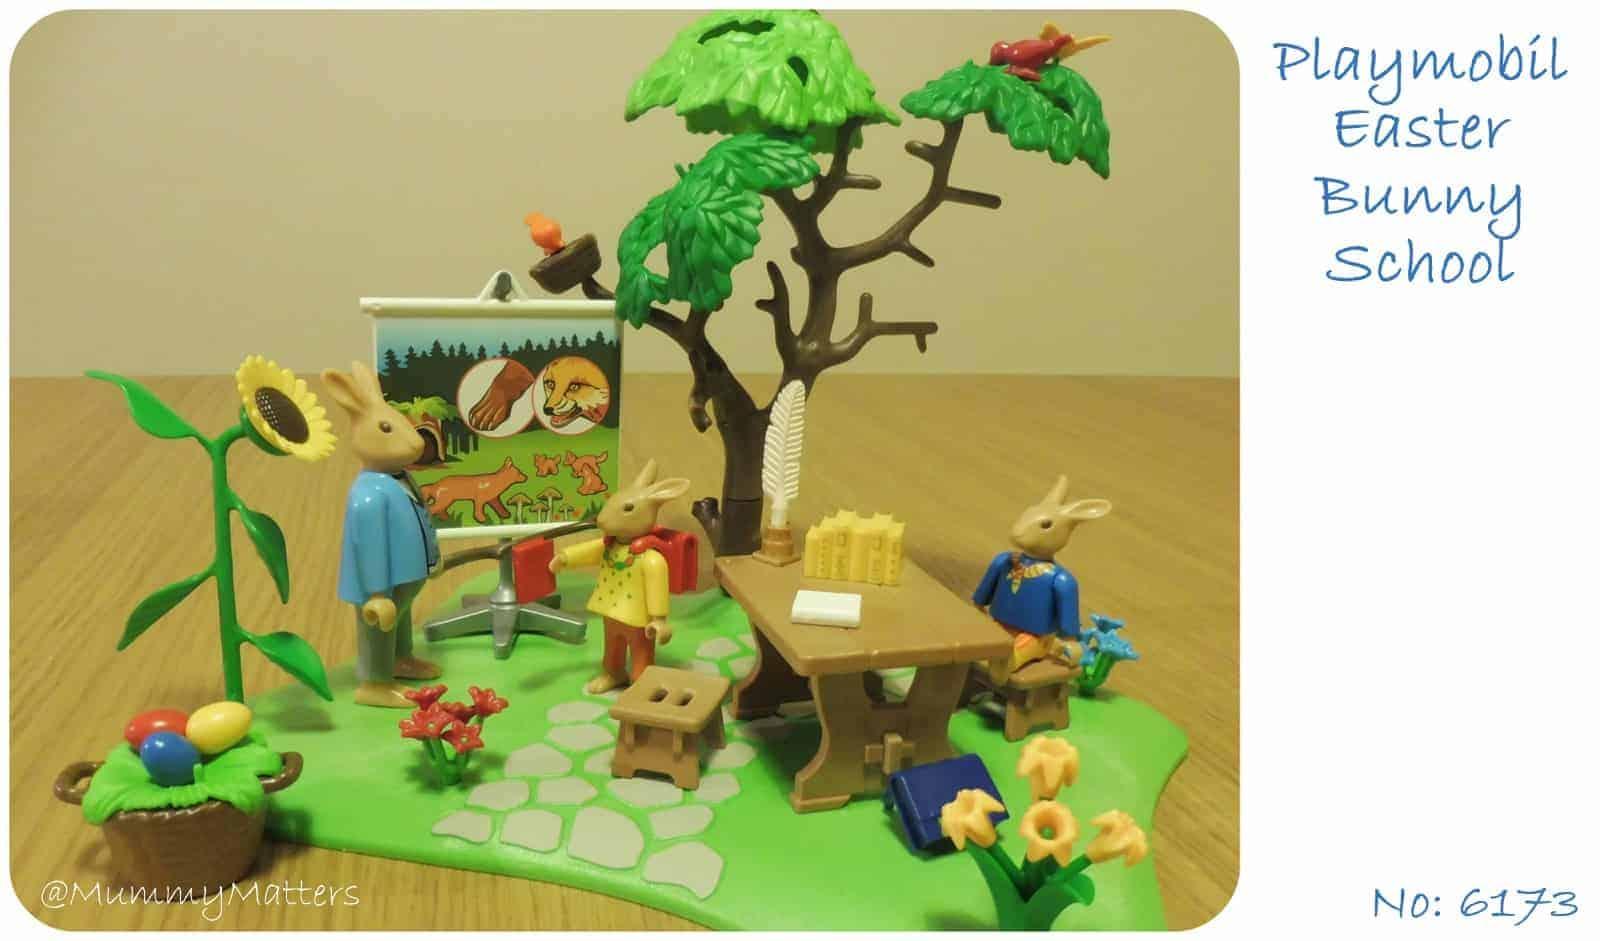 Playmobil Easter